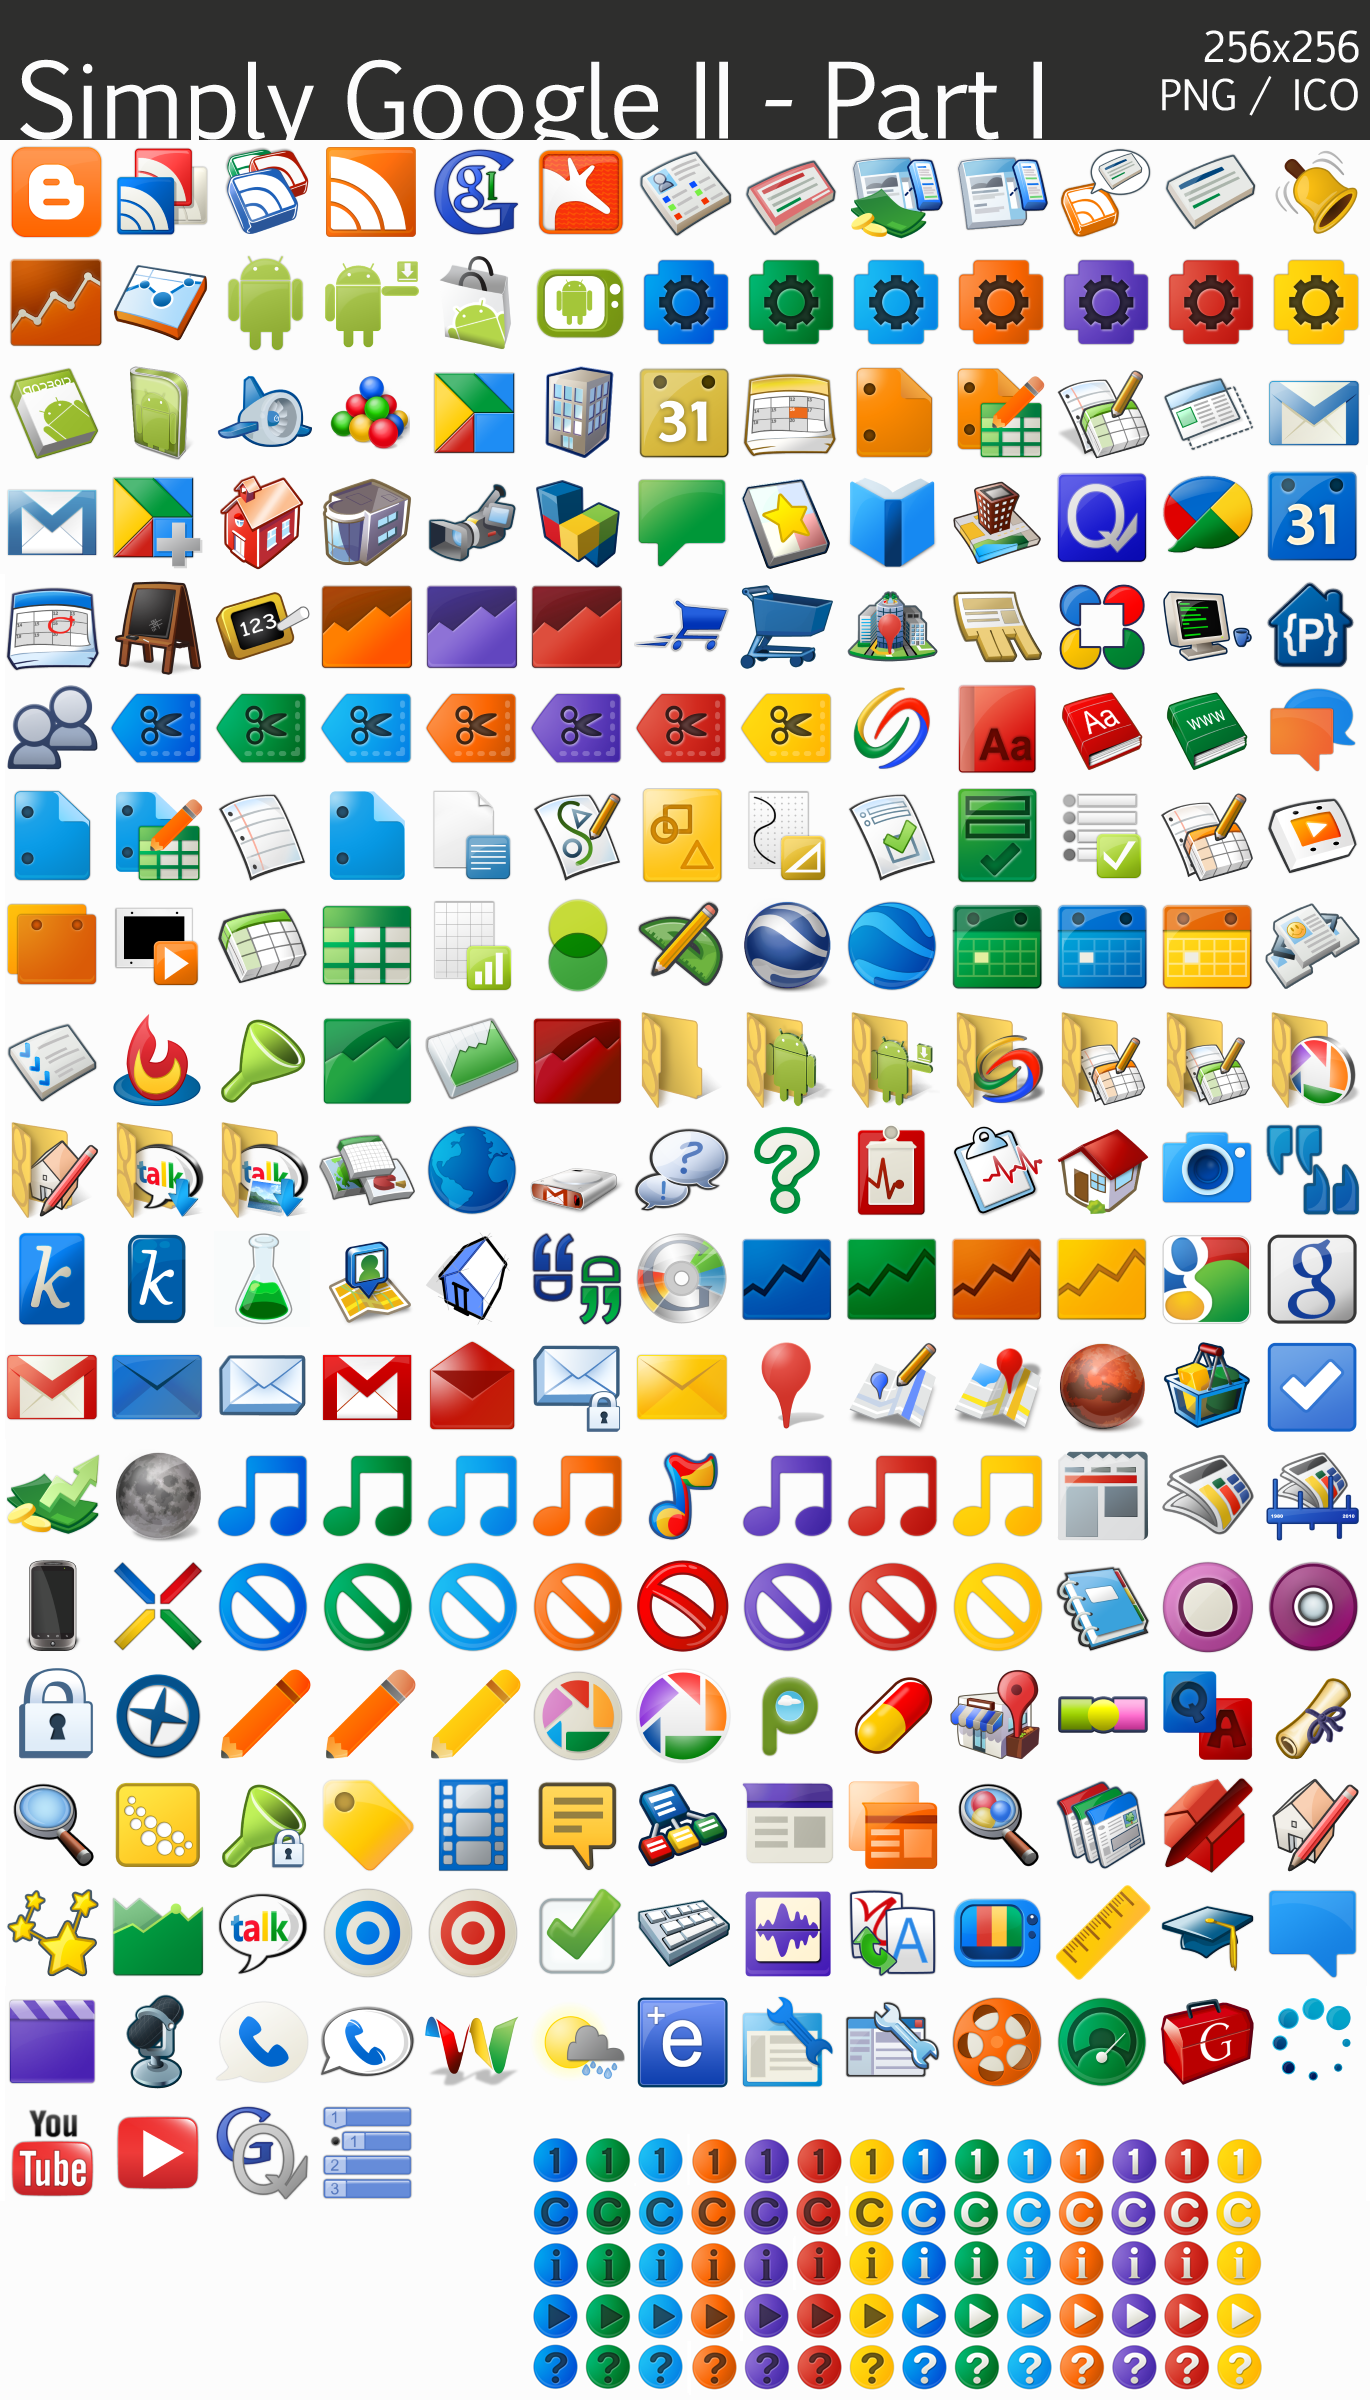 Simply Google II: Part I by ChadJackson